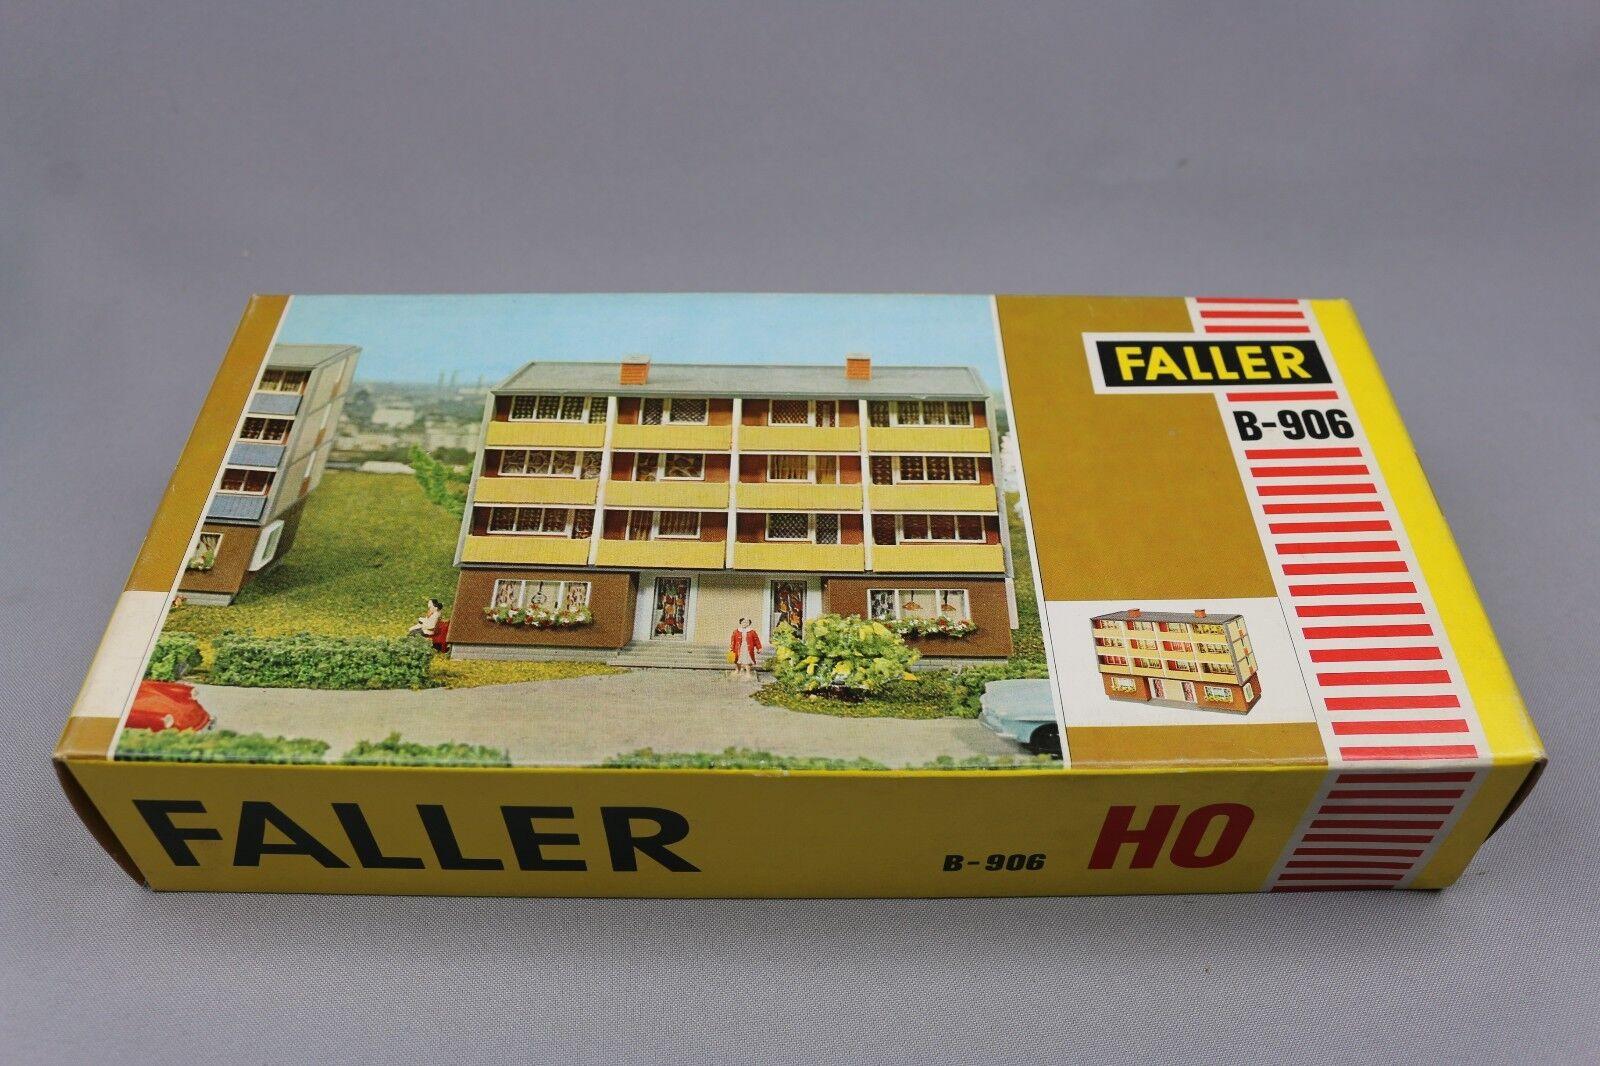 Z292 Faller B-906 maquette Ho 1 87 immeuble 3 etage ville Wohnhaus kit 906